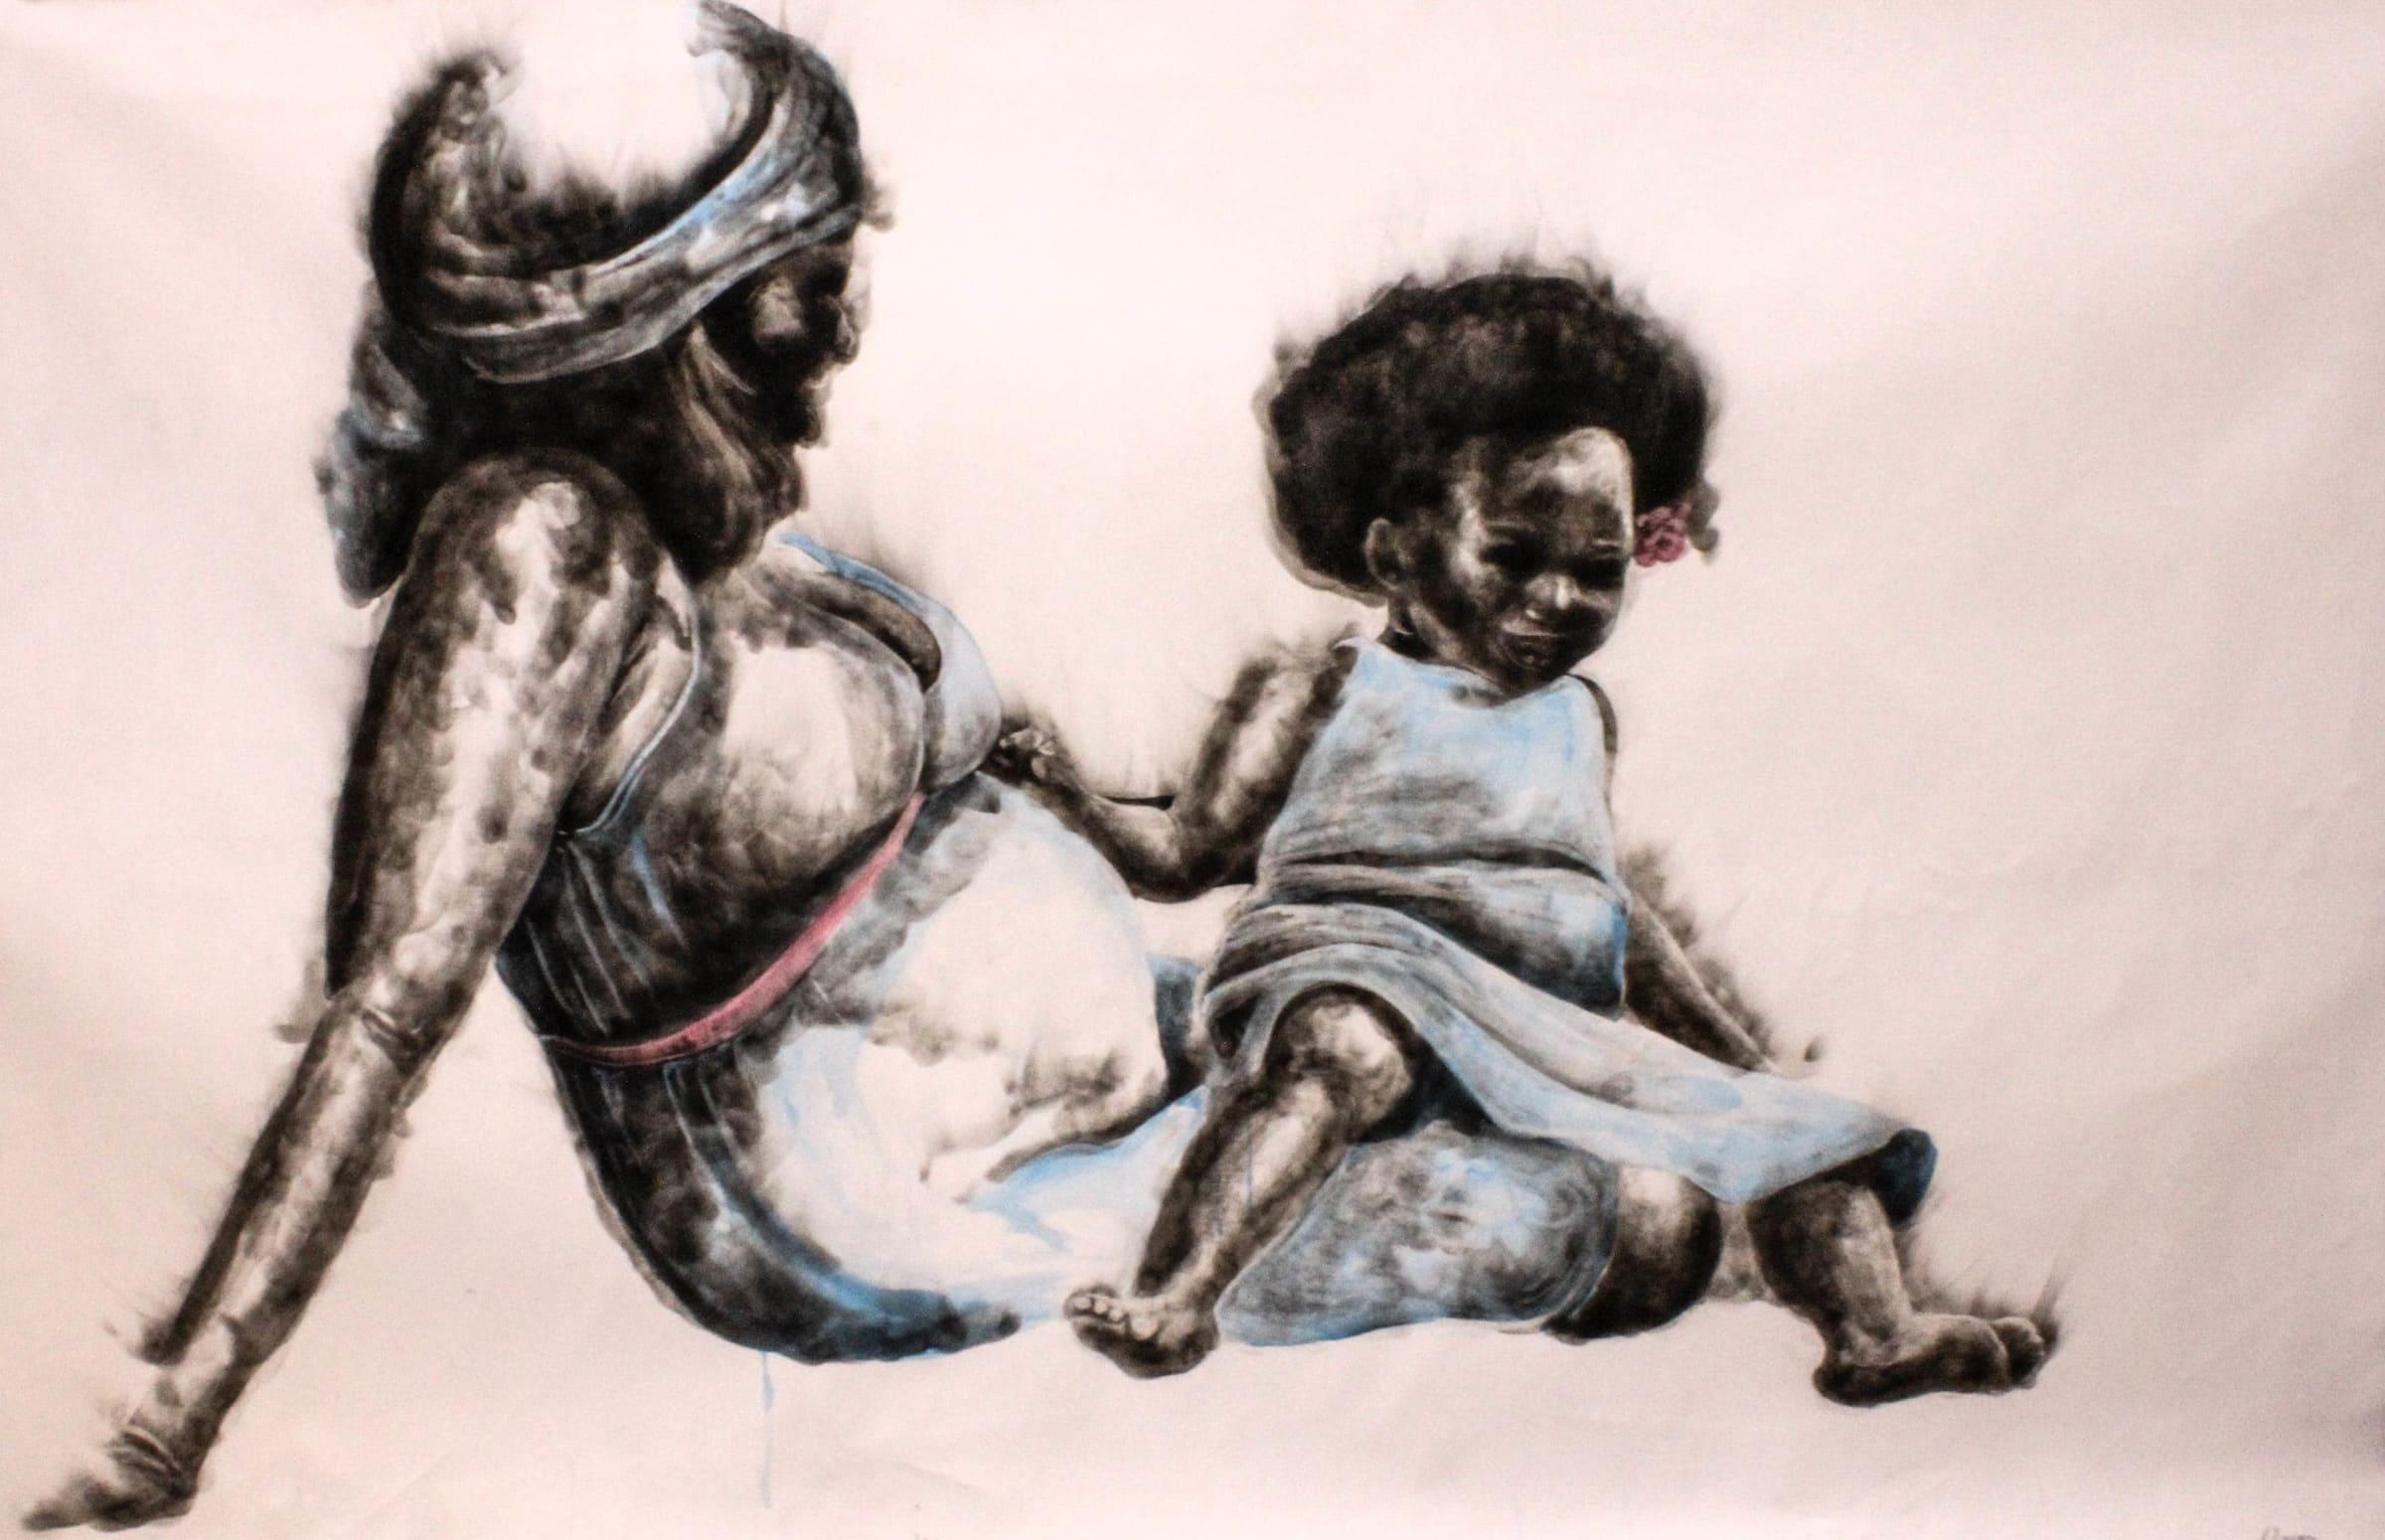 <span class=&#34;link fancybox-details-link&#34;><a href=&#34;/artists/54-azael-langa/works/2174-azael-langa-when-i-become-2018/&#34;>View Detail Page</a></span><div class=&#34;artist&#34;><strong>Azael Langa</strong></div> <div class=&#34;title&#34;><em>When I Become</em>, 2018</div> <div class=&#34;medium&#34;>Smoke And Ink  On Canvas</div> <div class=&#34;dimensions&#34;>160cm x 250cm (181cm x 277.7cm framed)</div>